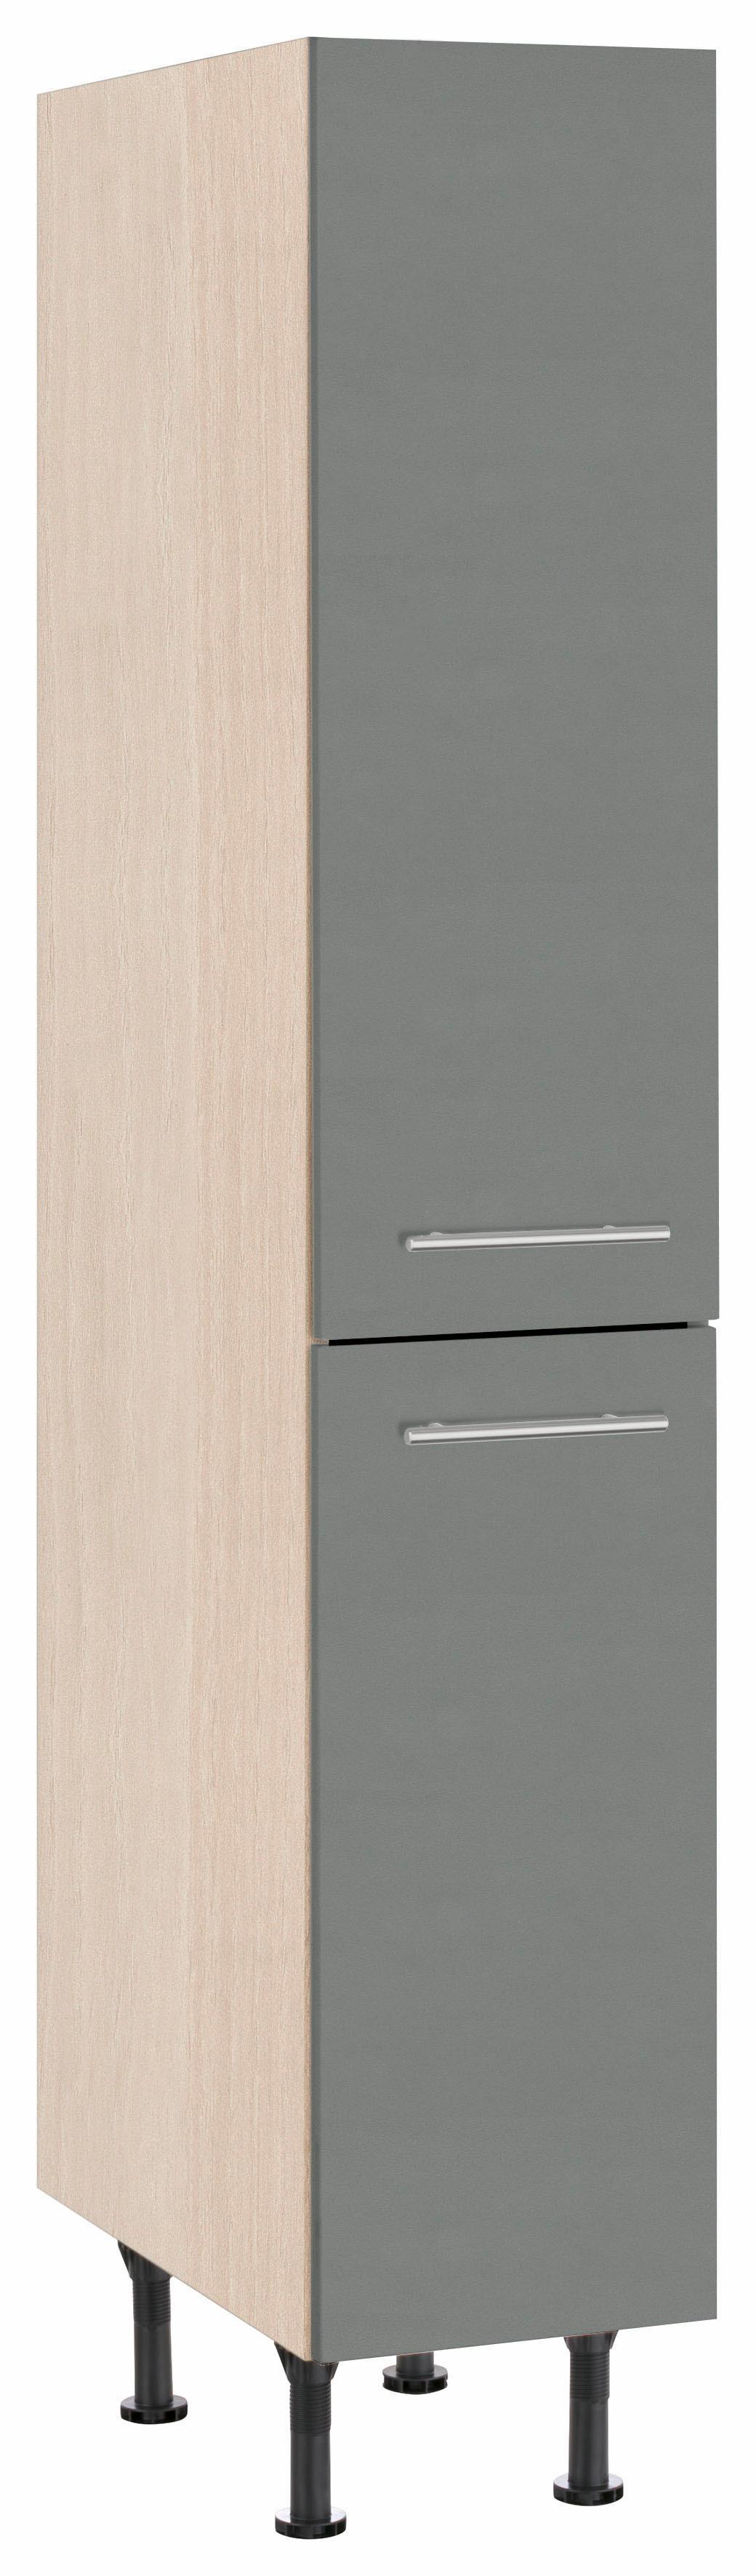 OPTIFIT Apothekerschrank Bern | Küche und Esszimmer > Küchenschränke > Apothekerschränke | Grau | Nachbildung - Edelstahl - Melamin | Optifit